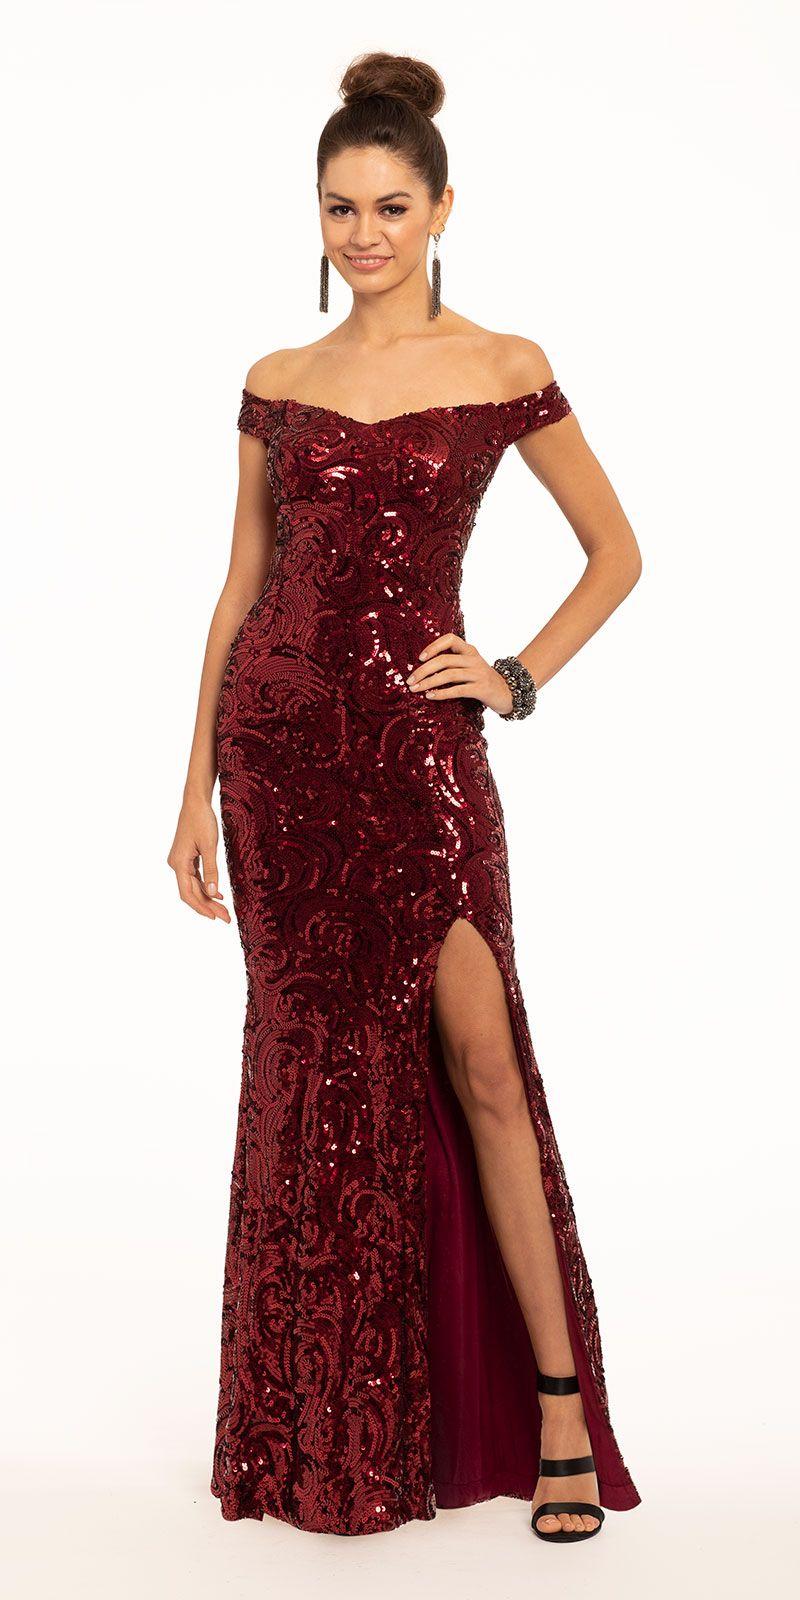 Off The Shoulder All Over Sequin Dress Wedding Guest Dress Pageant Dresses Sequin Dress [ 1600 x 800 Pixel ]